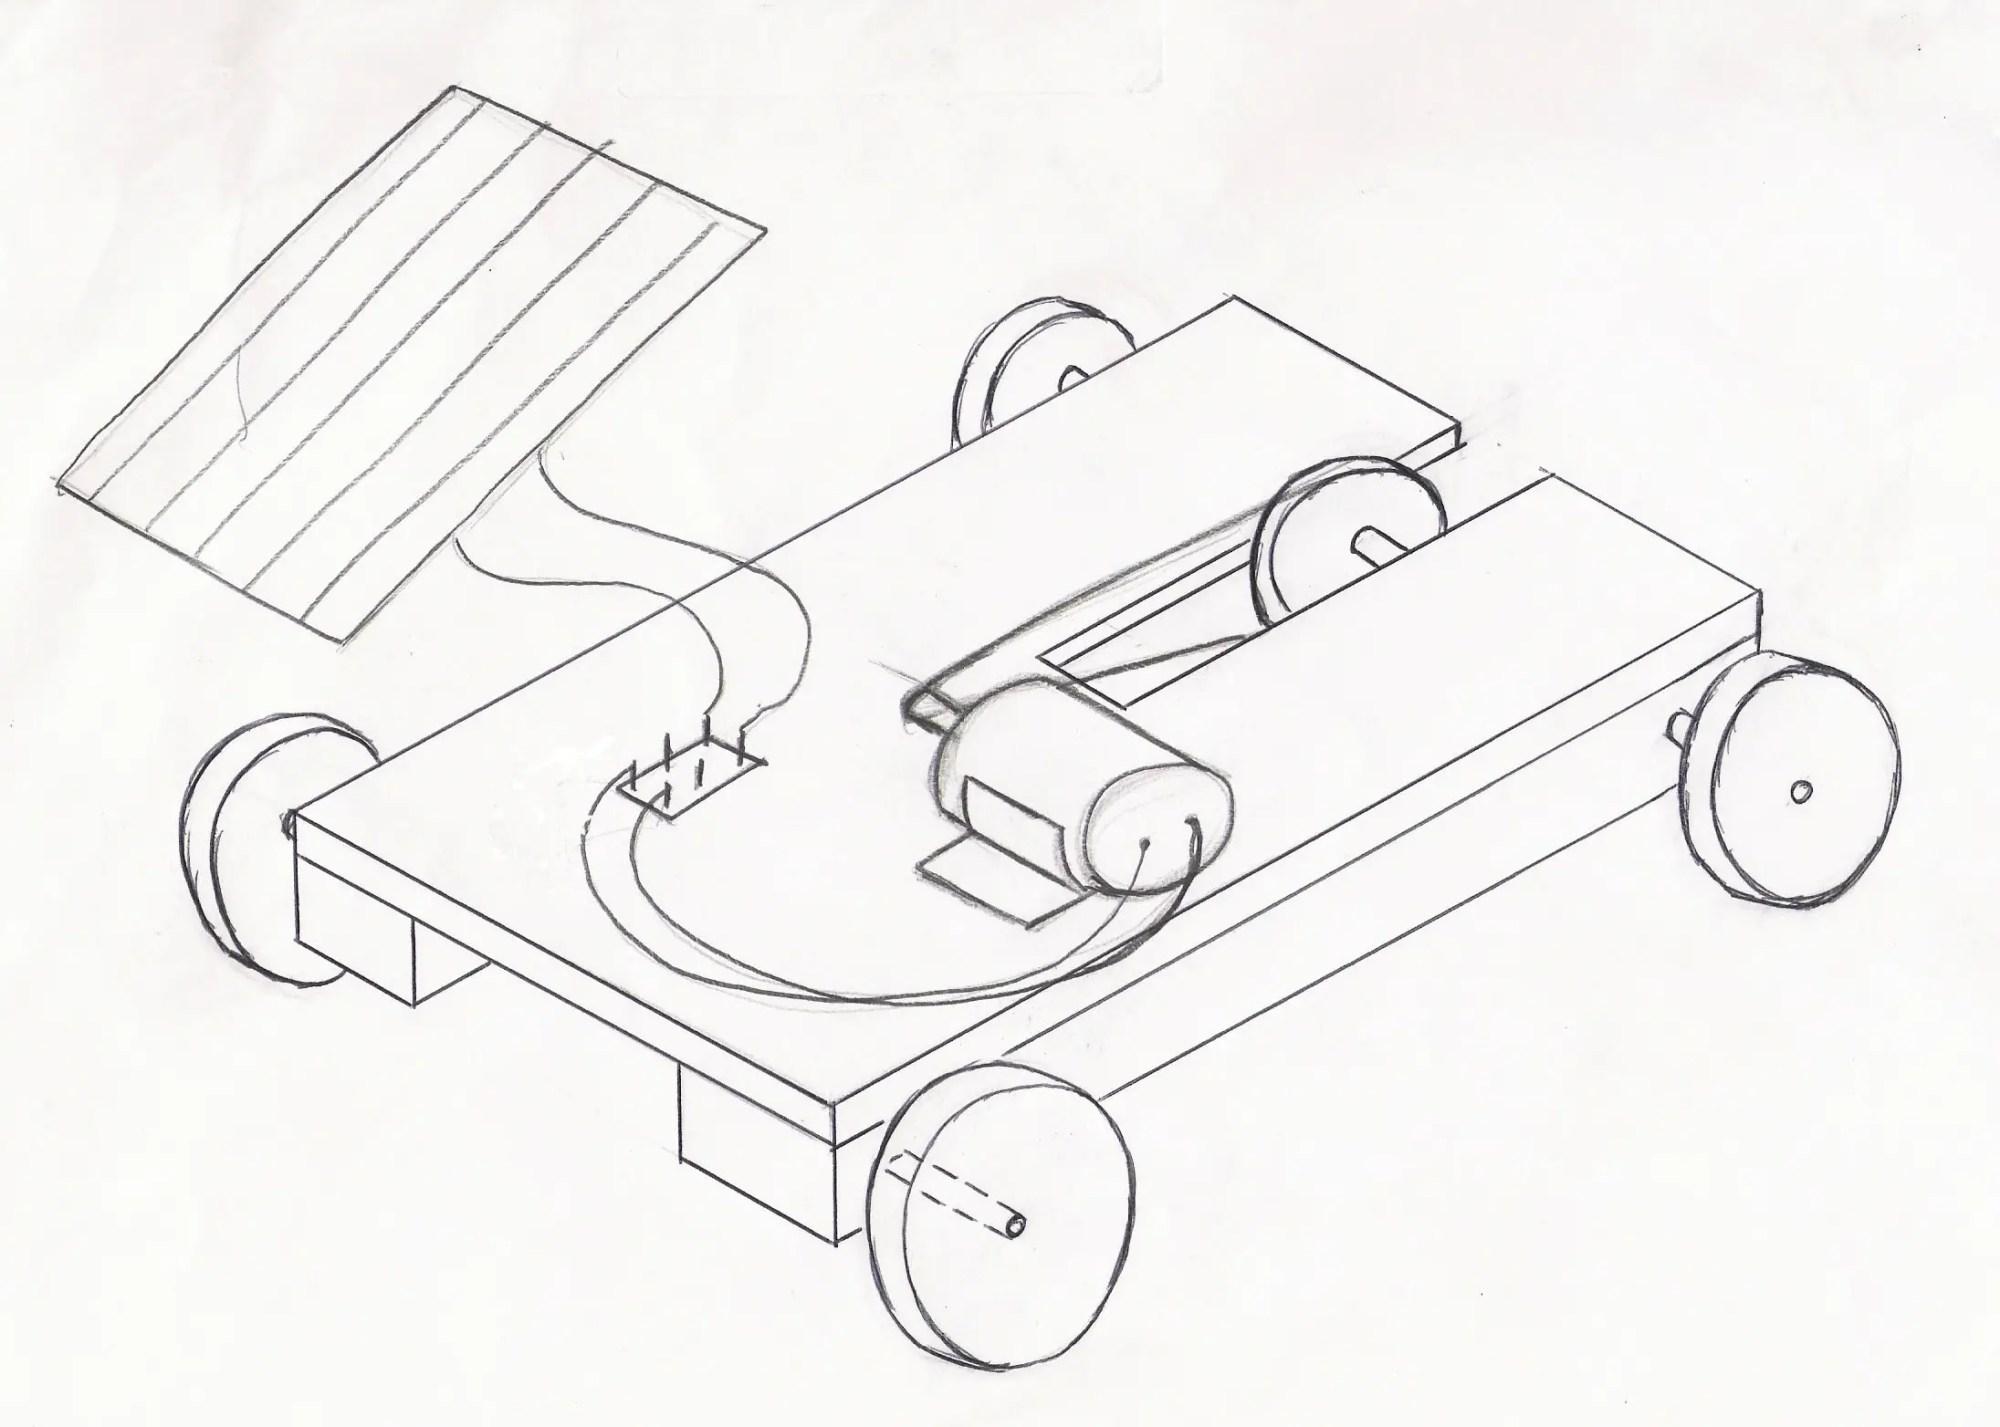 hight resolution of solar car diagram my wiring diagram solar panel car diagram